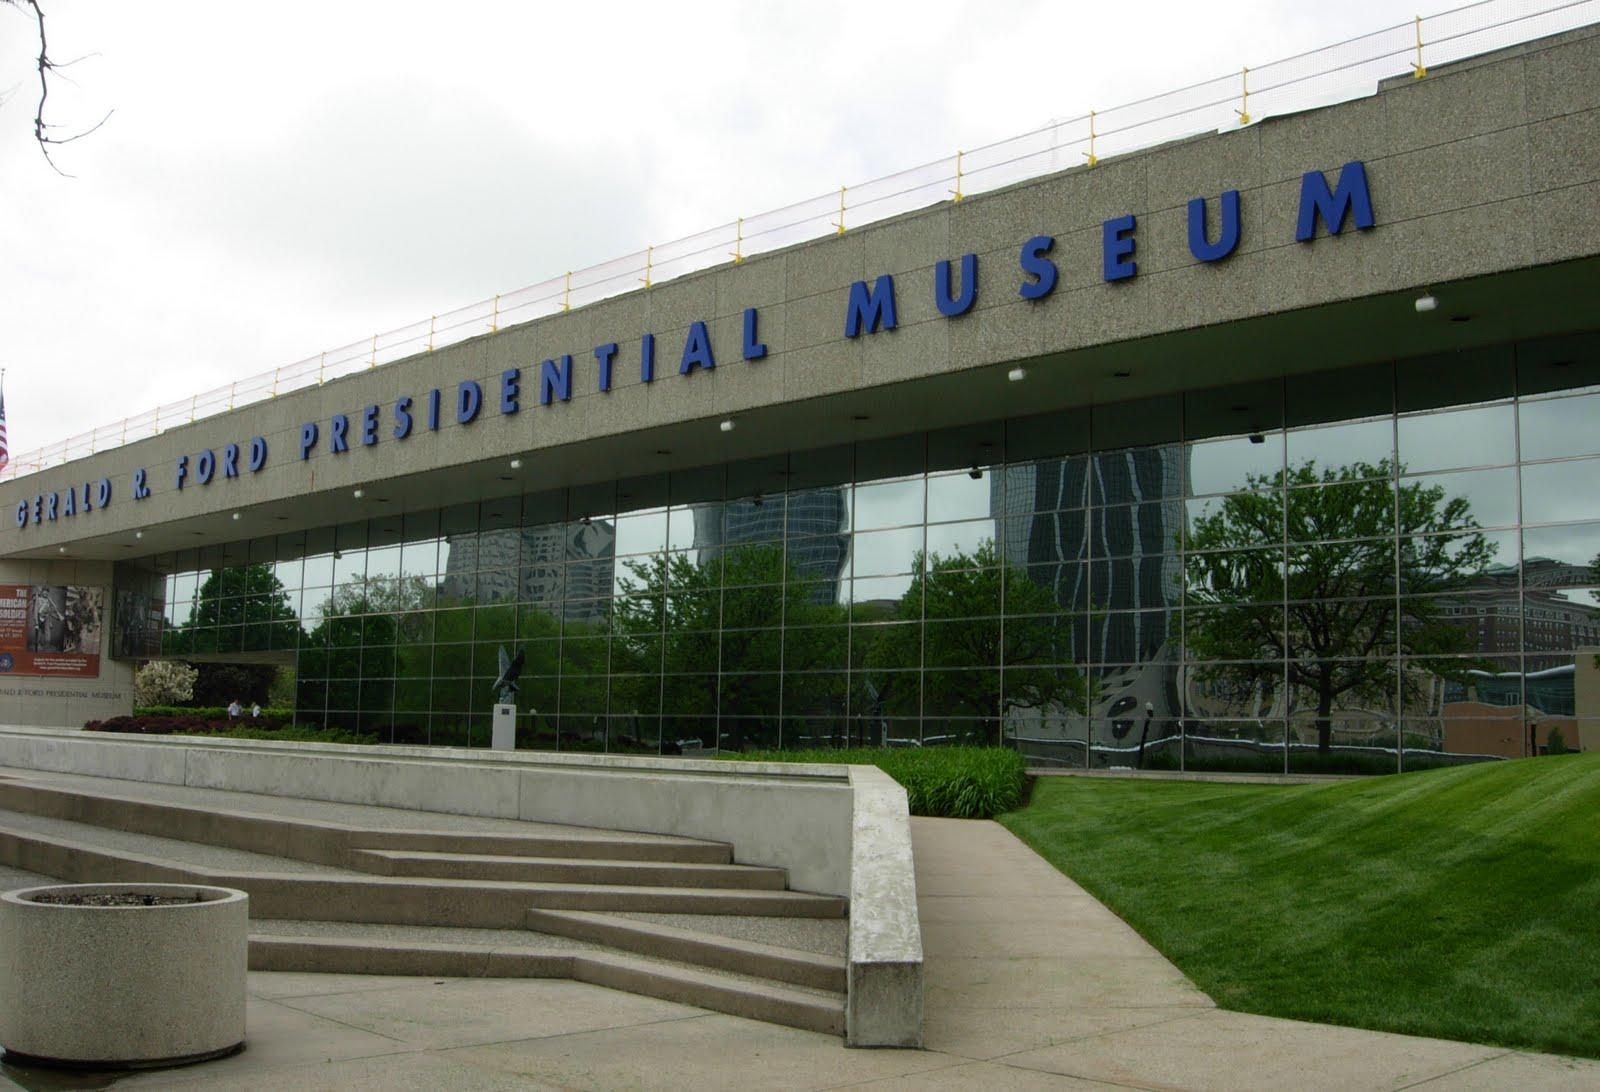 Grand Rapids Ford >> janeandbobandmore: GERALD FORD MUSEUM - GRAND RAPIDS, MI